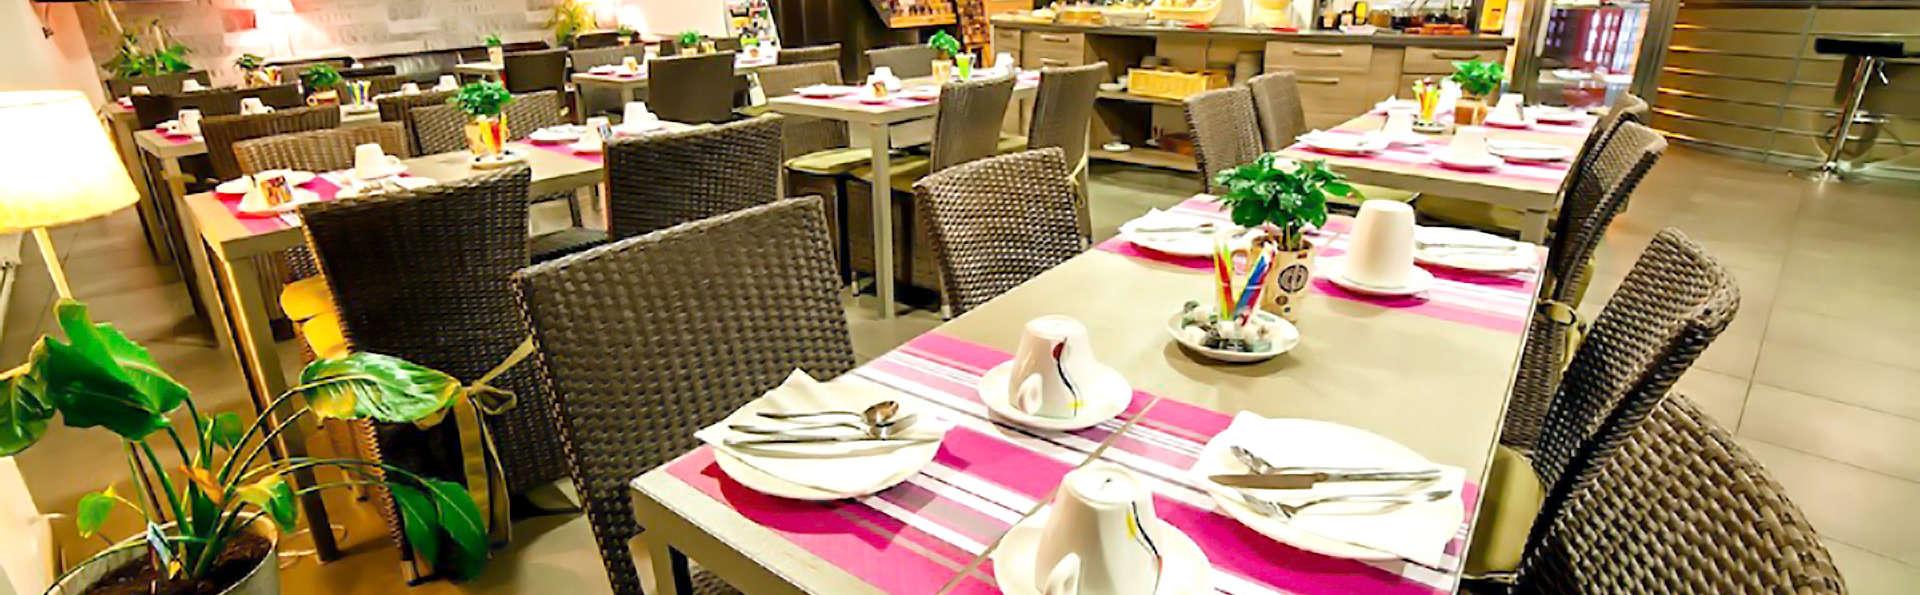 Week-end avec dîner près de Perpignan